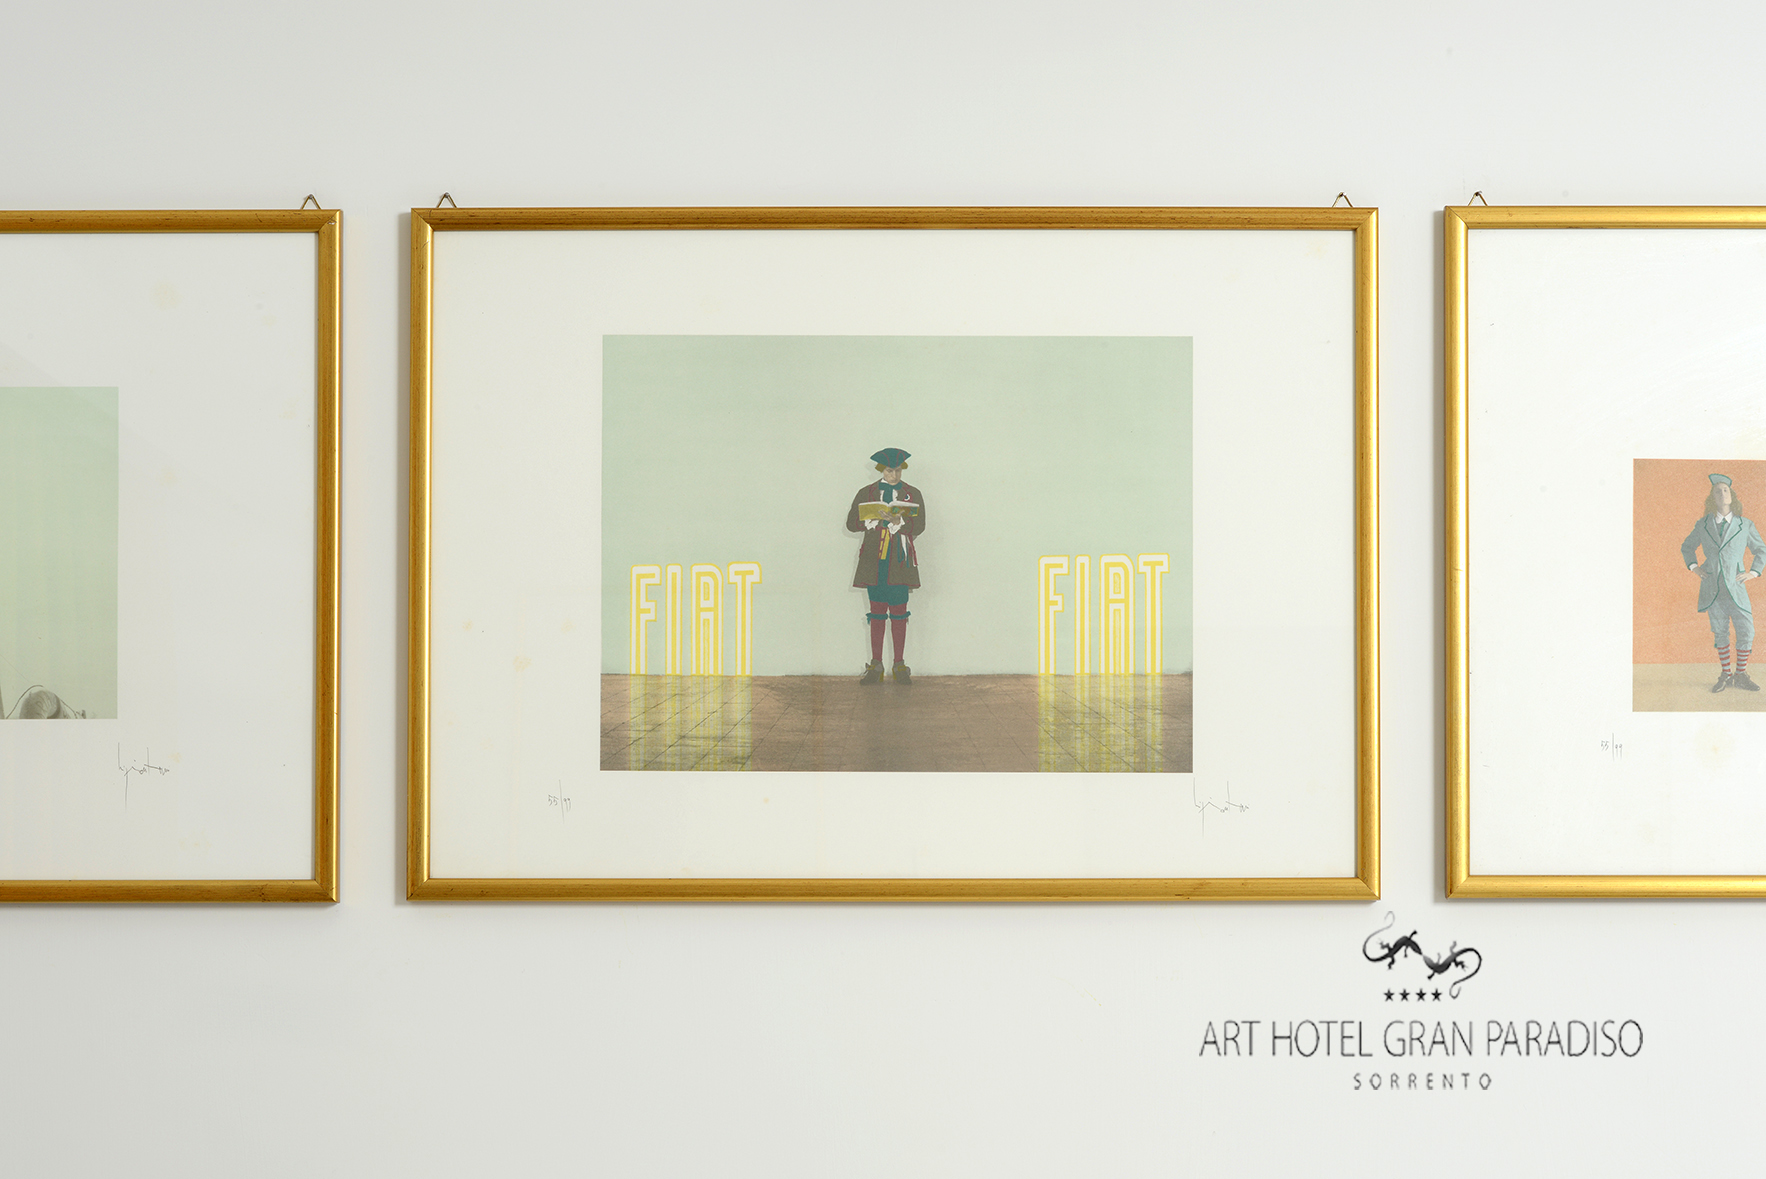 Art_Hotel_Gran_Paradiso_2013_411_Luigi_Ontani_10.jpg